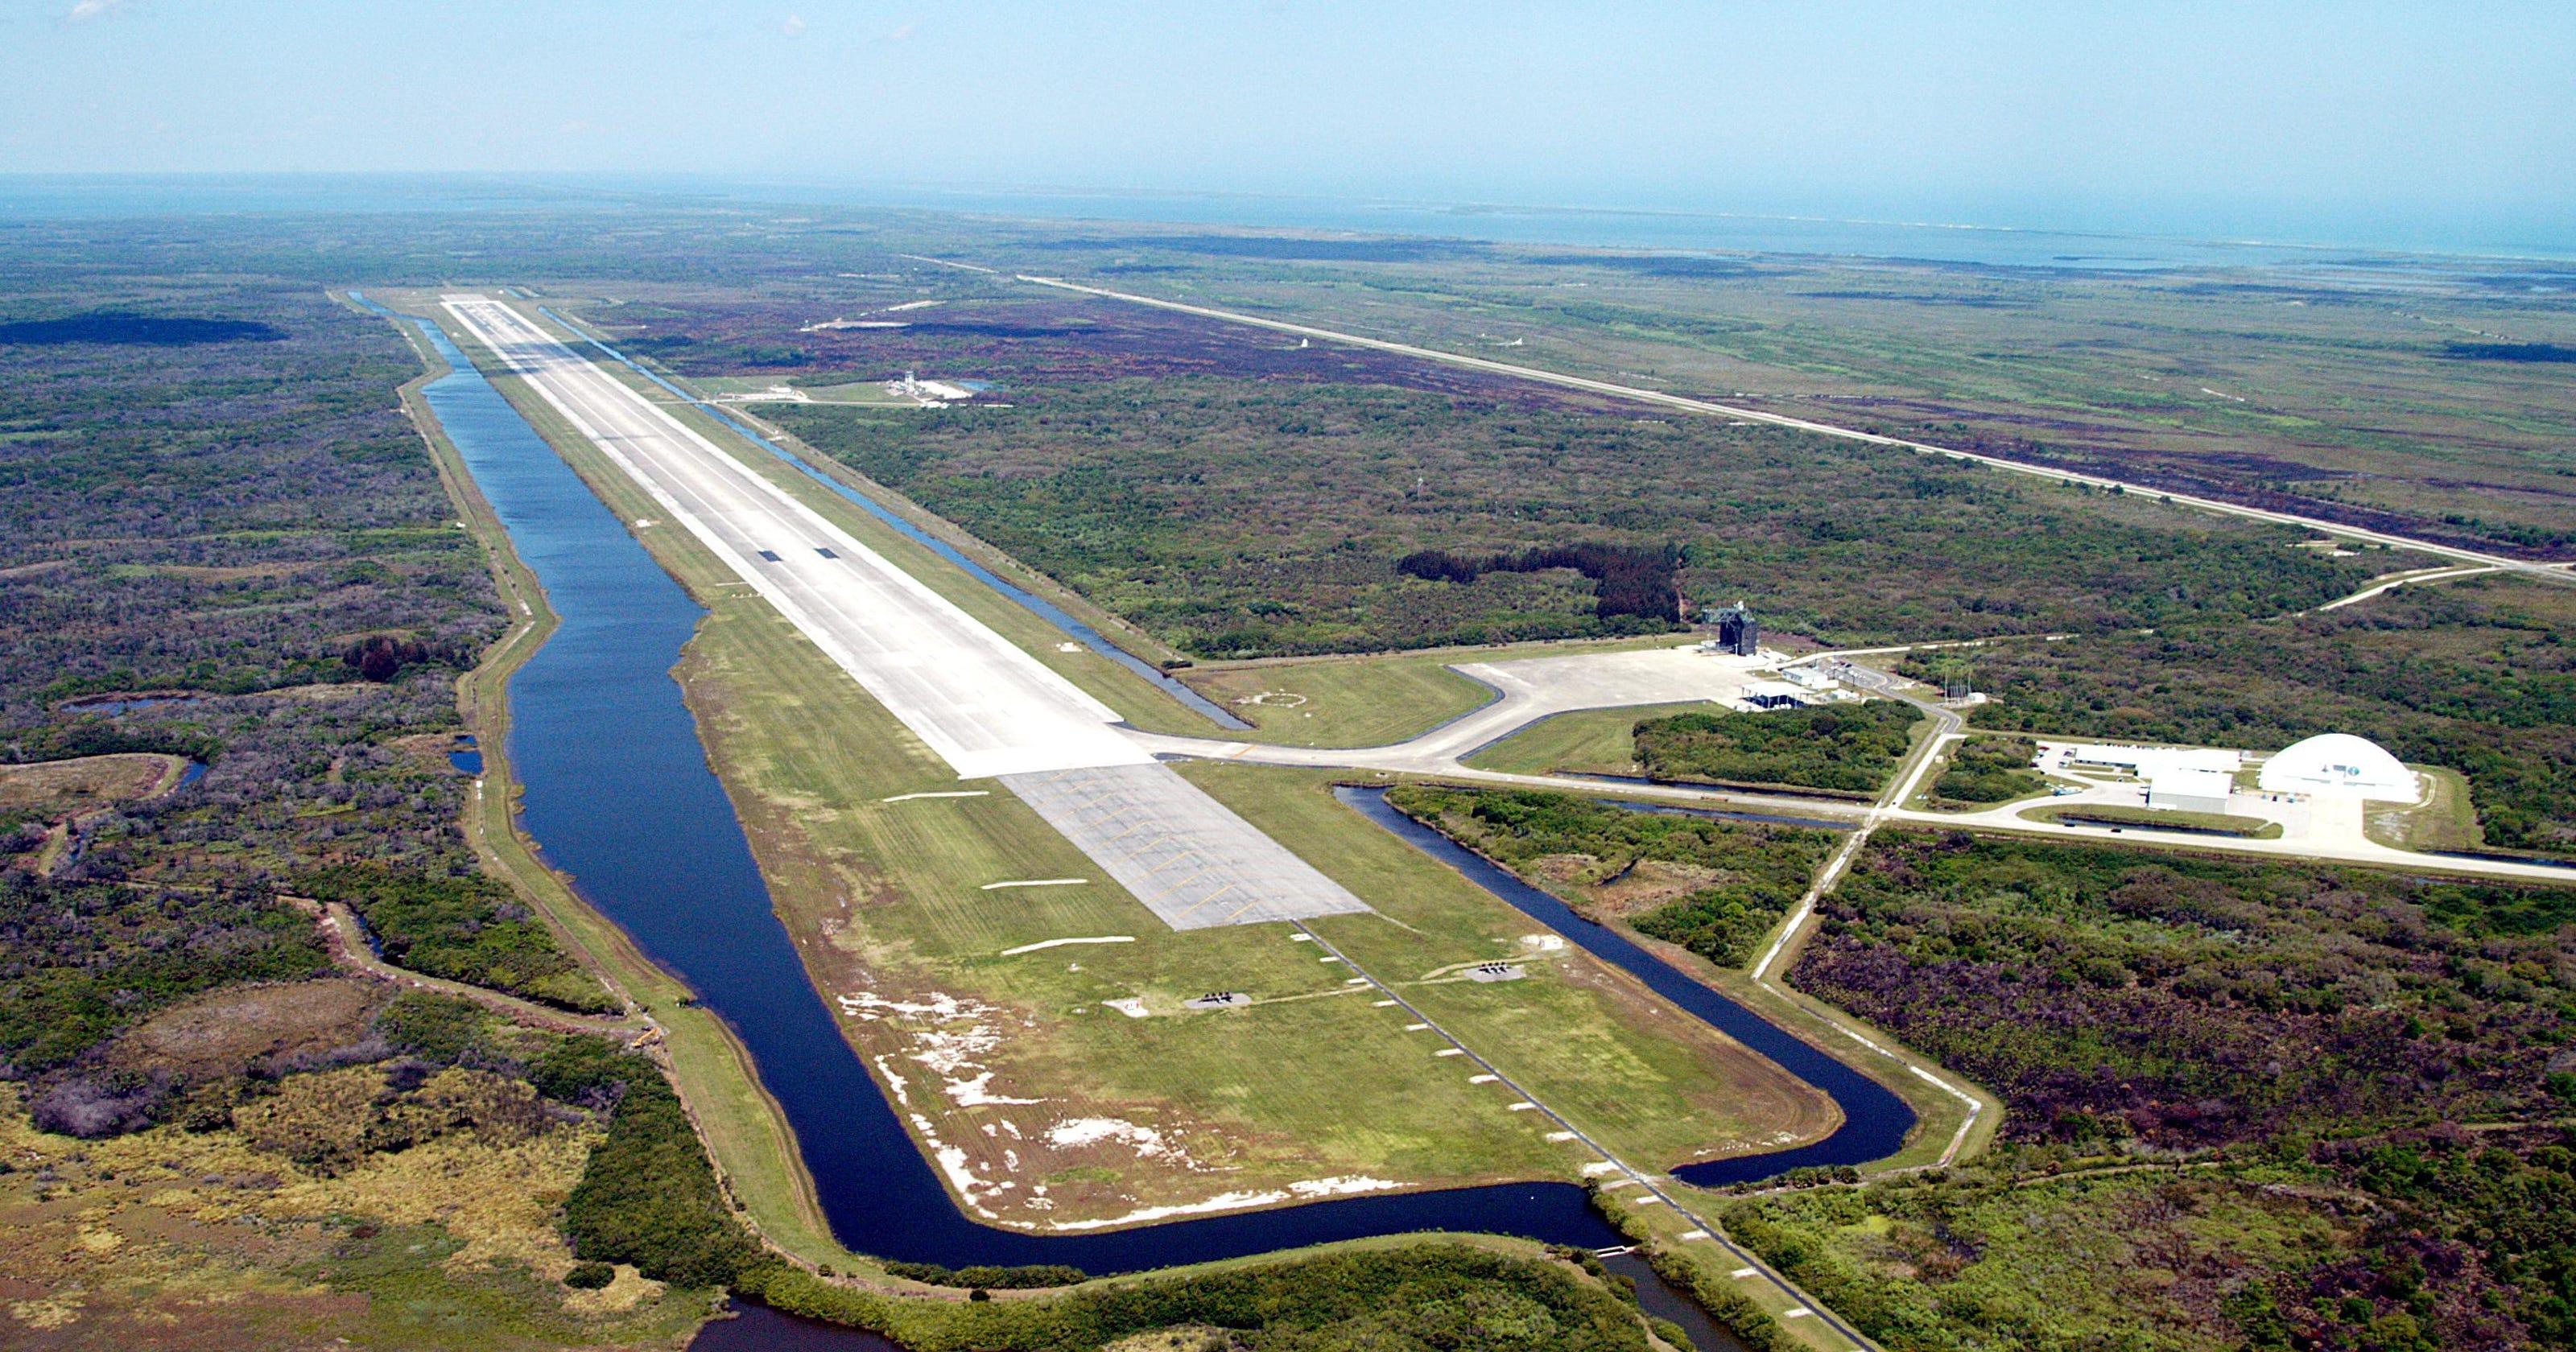 nasa crows landing airport and test facility - HD1280×848